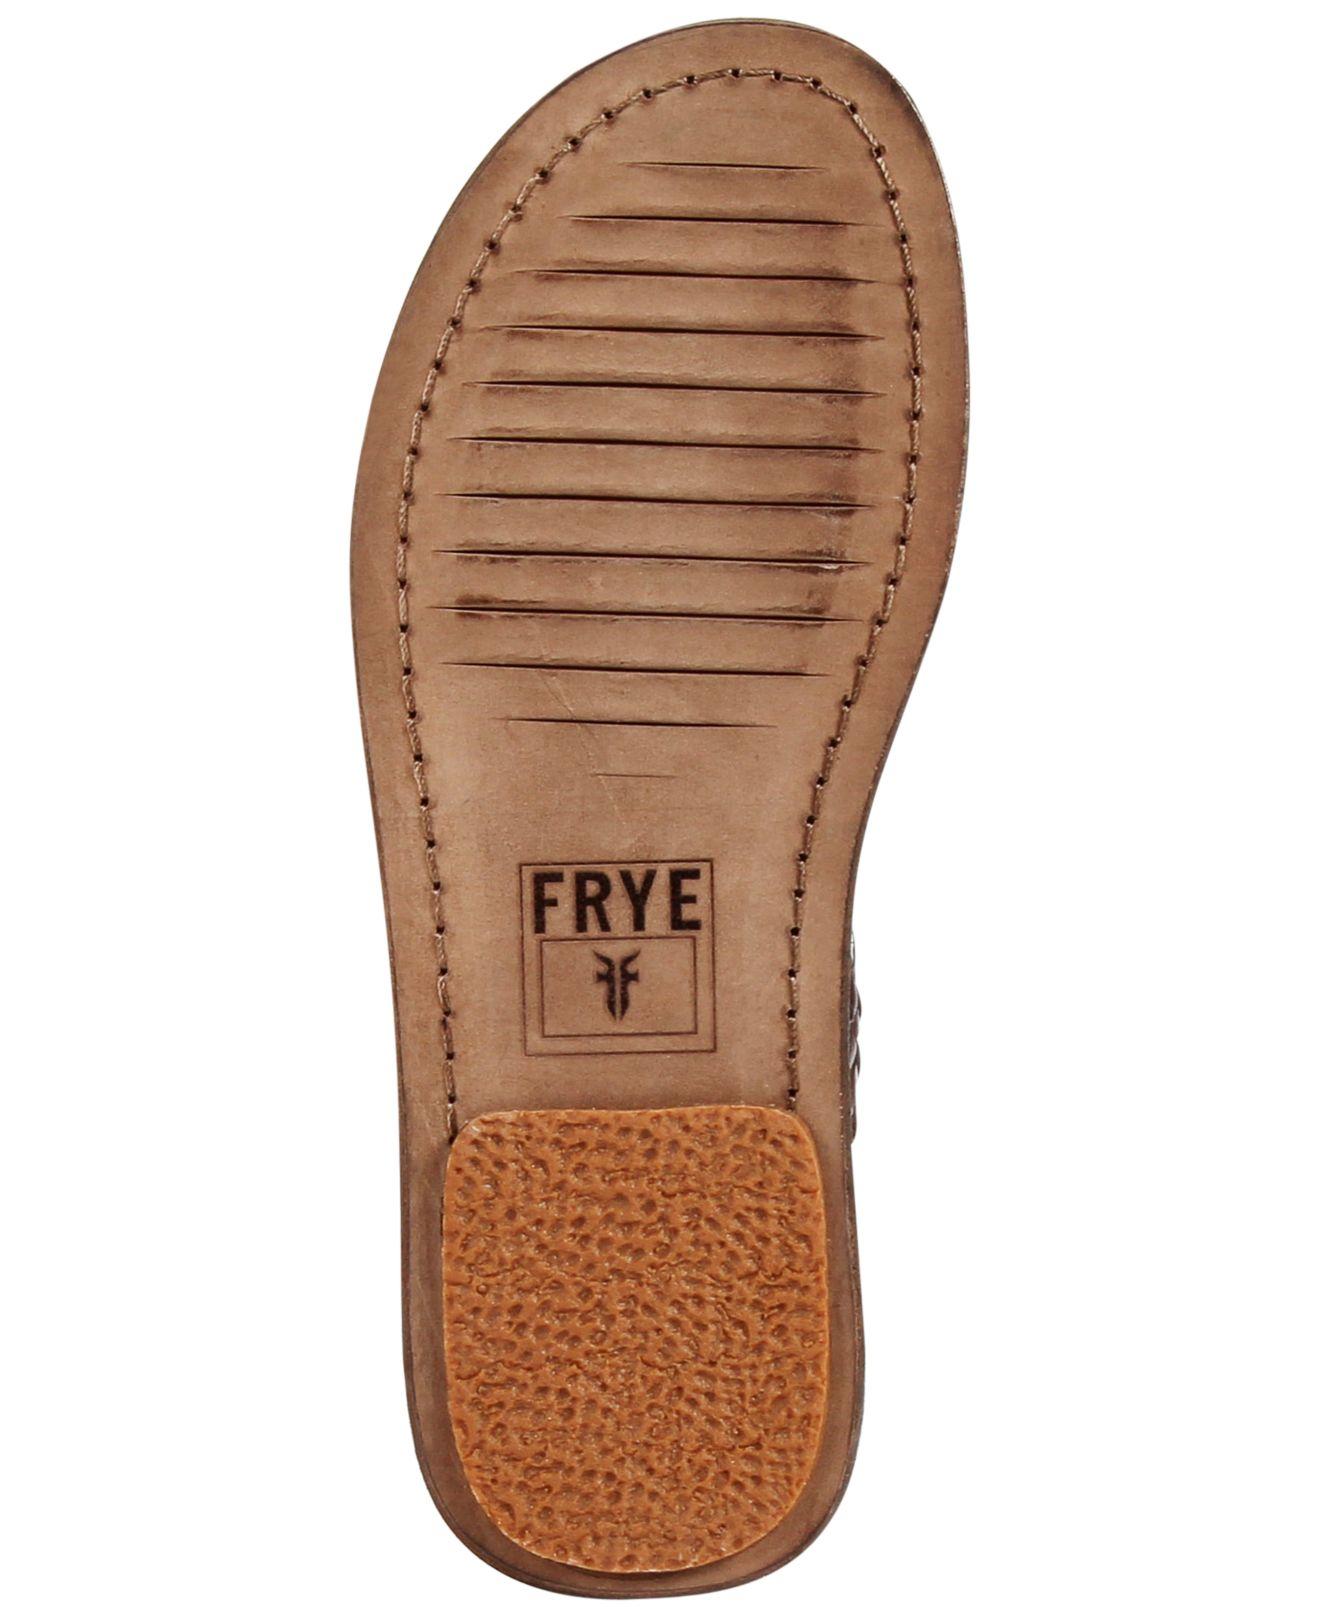 Frye Lawson Huarache Sandals In Dark Brown Brown For Men